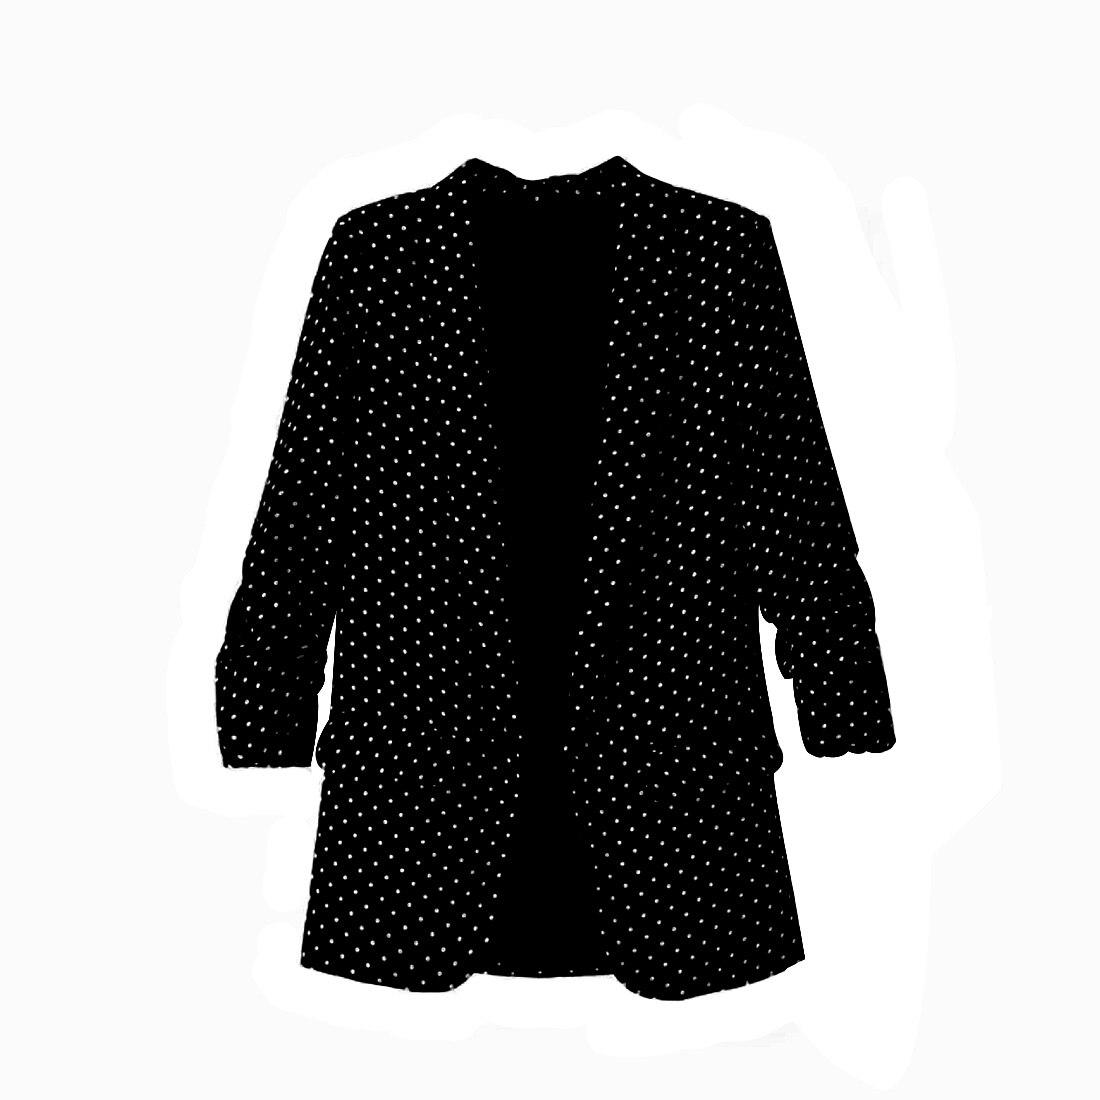 2017 Women Polka Dot Blazer Padded Shoulder Notched Collar Long Sleeve Coat Casual Outerwear Casaco Feminine Tops